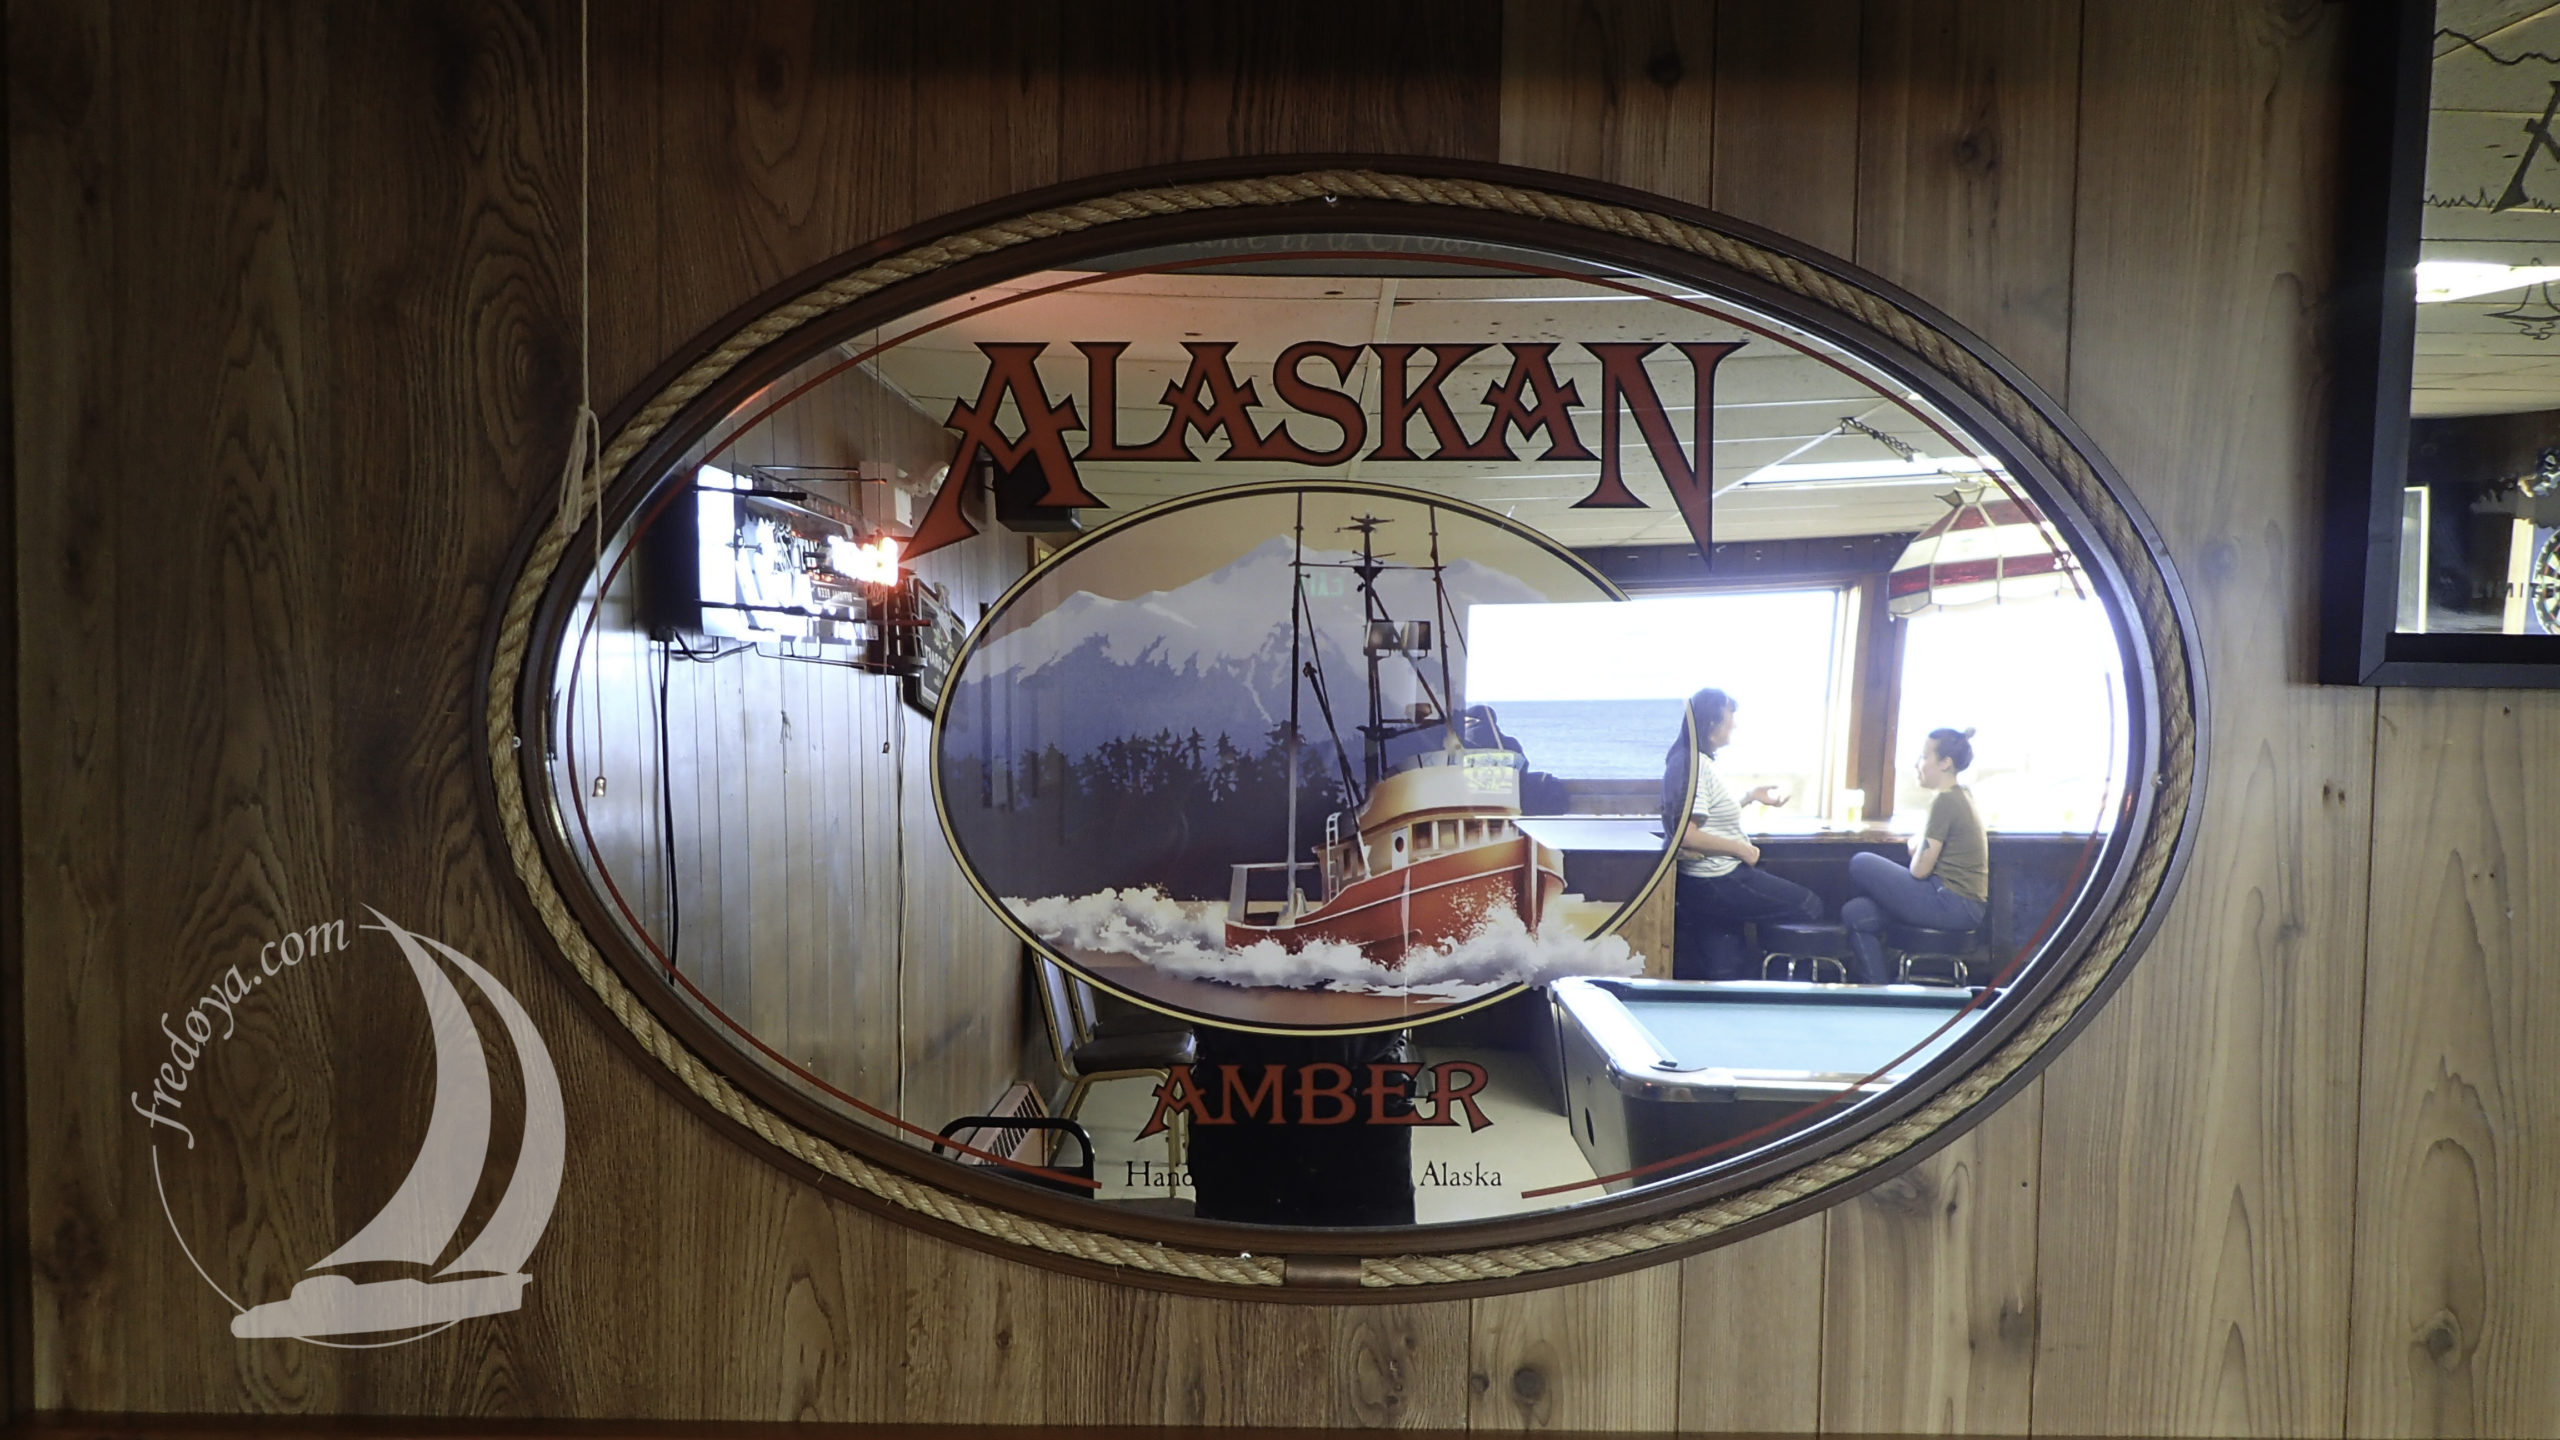 Alaska, Nome, NWP - Aout - Septembre 2019